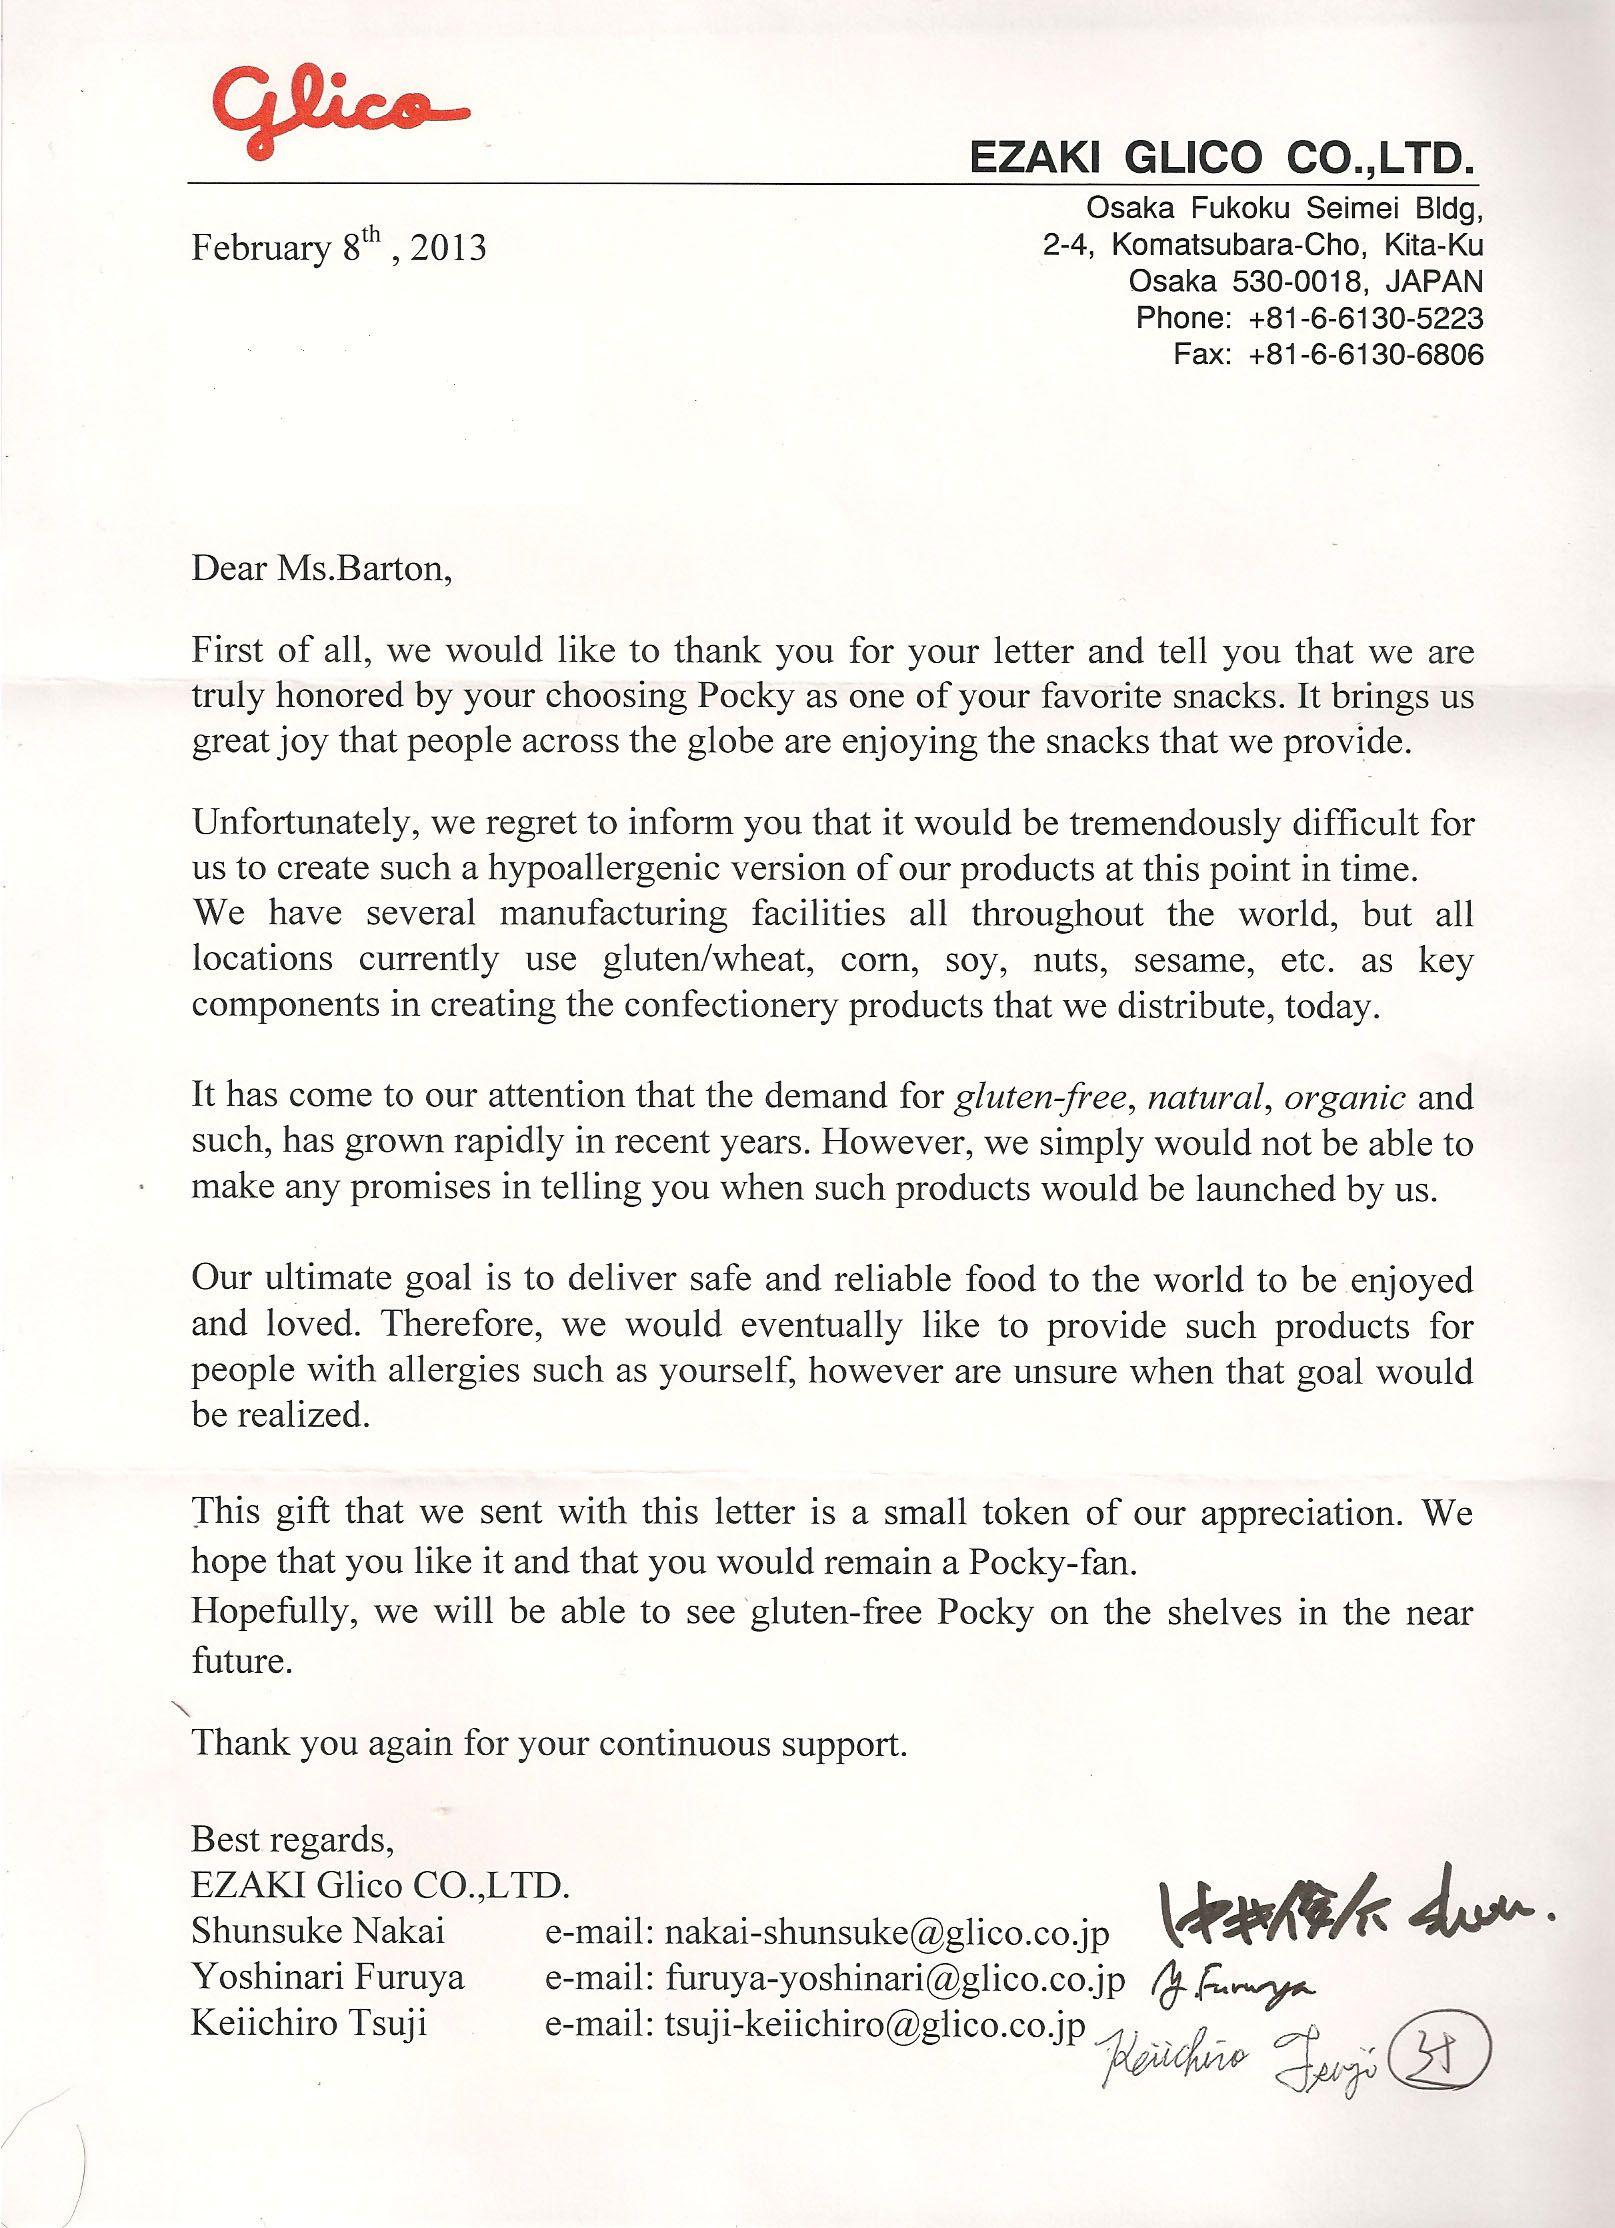 Breaking News Ezaki Glico Responds To Our Letter! The